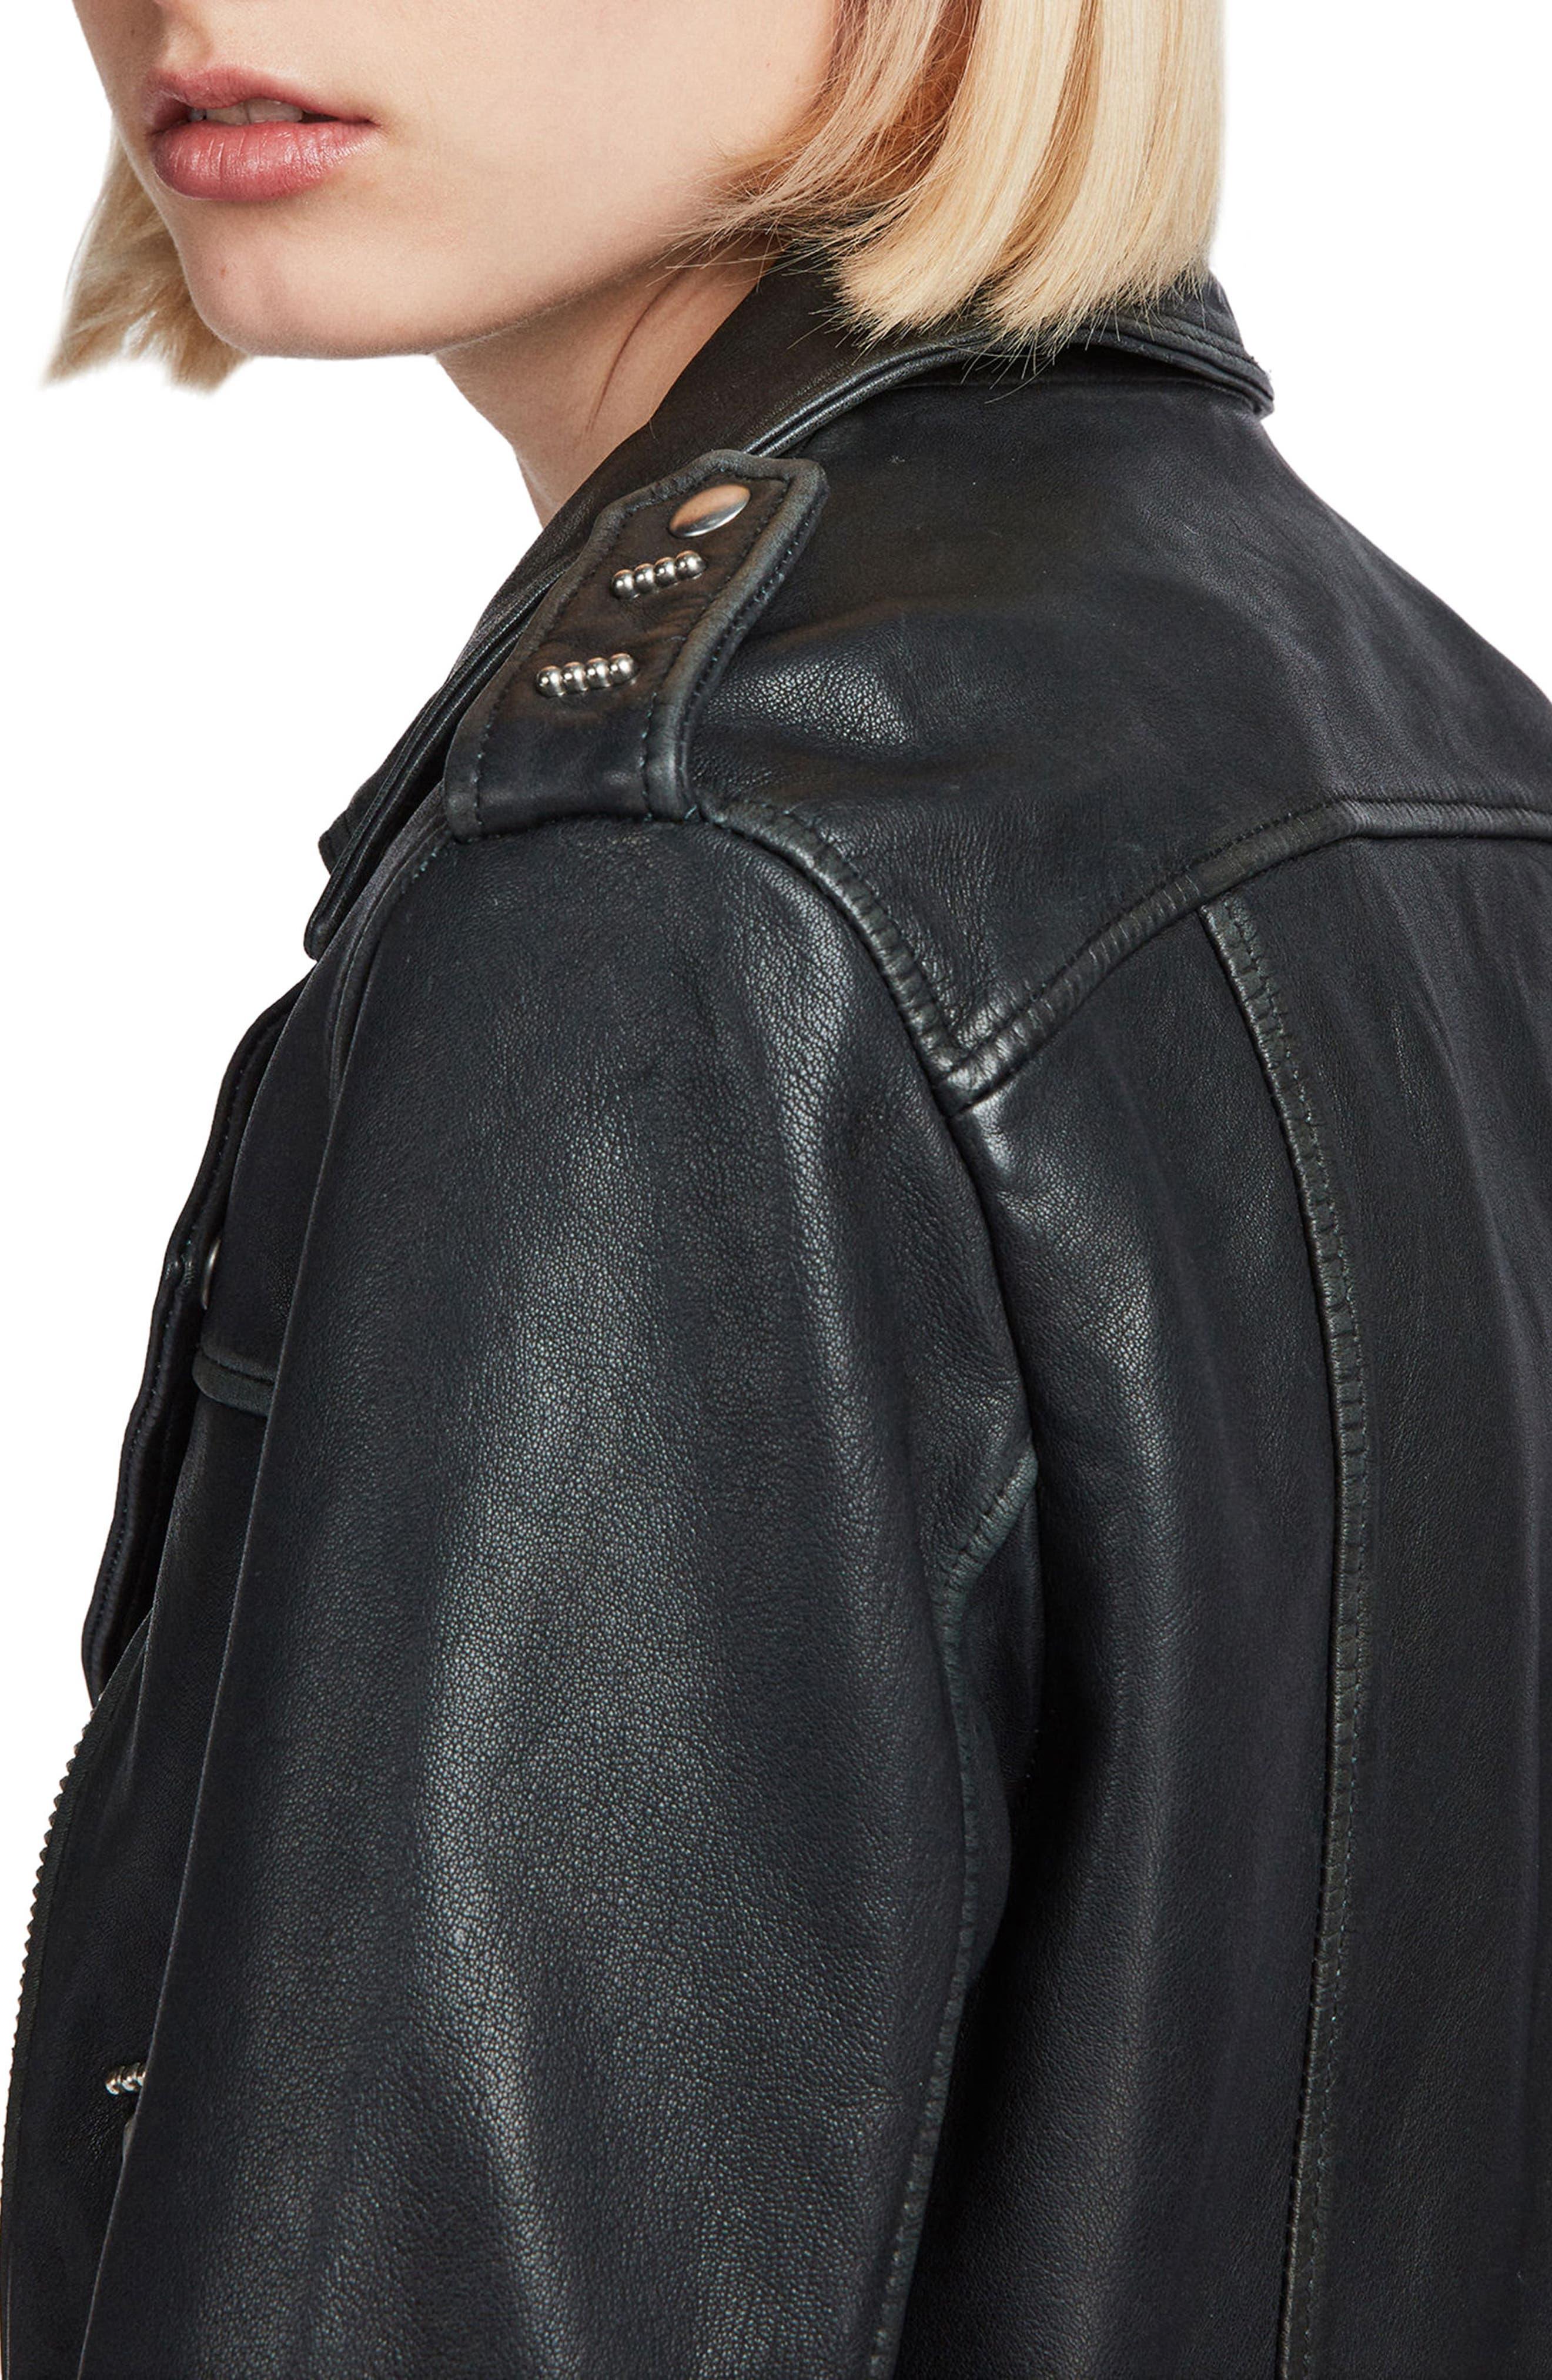 Lara Sheepskin Leather Biker Jacket,                             Alternate thumbnail 4, color,                             Black